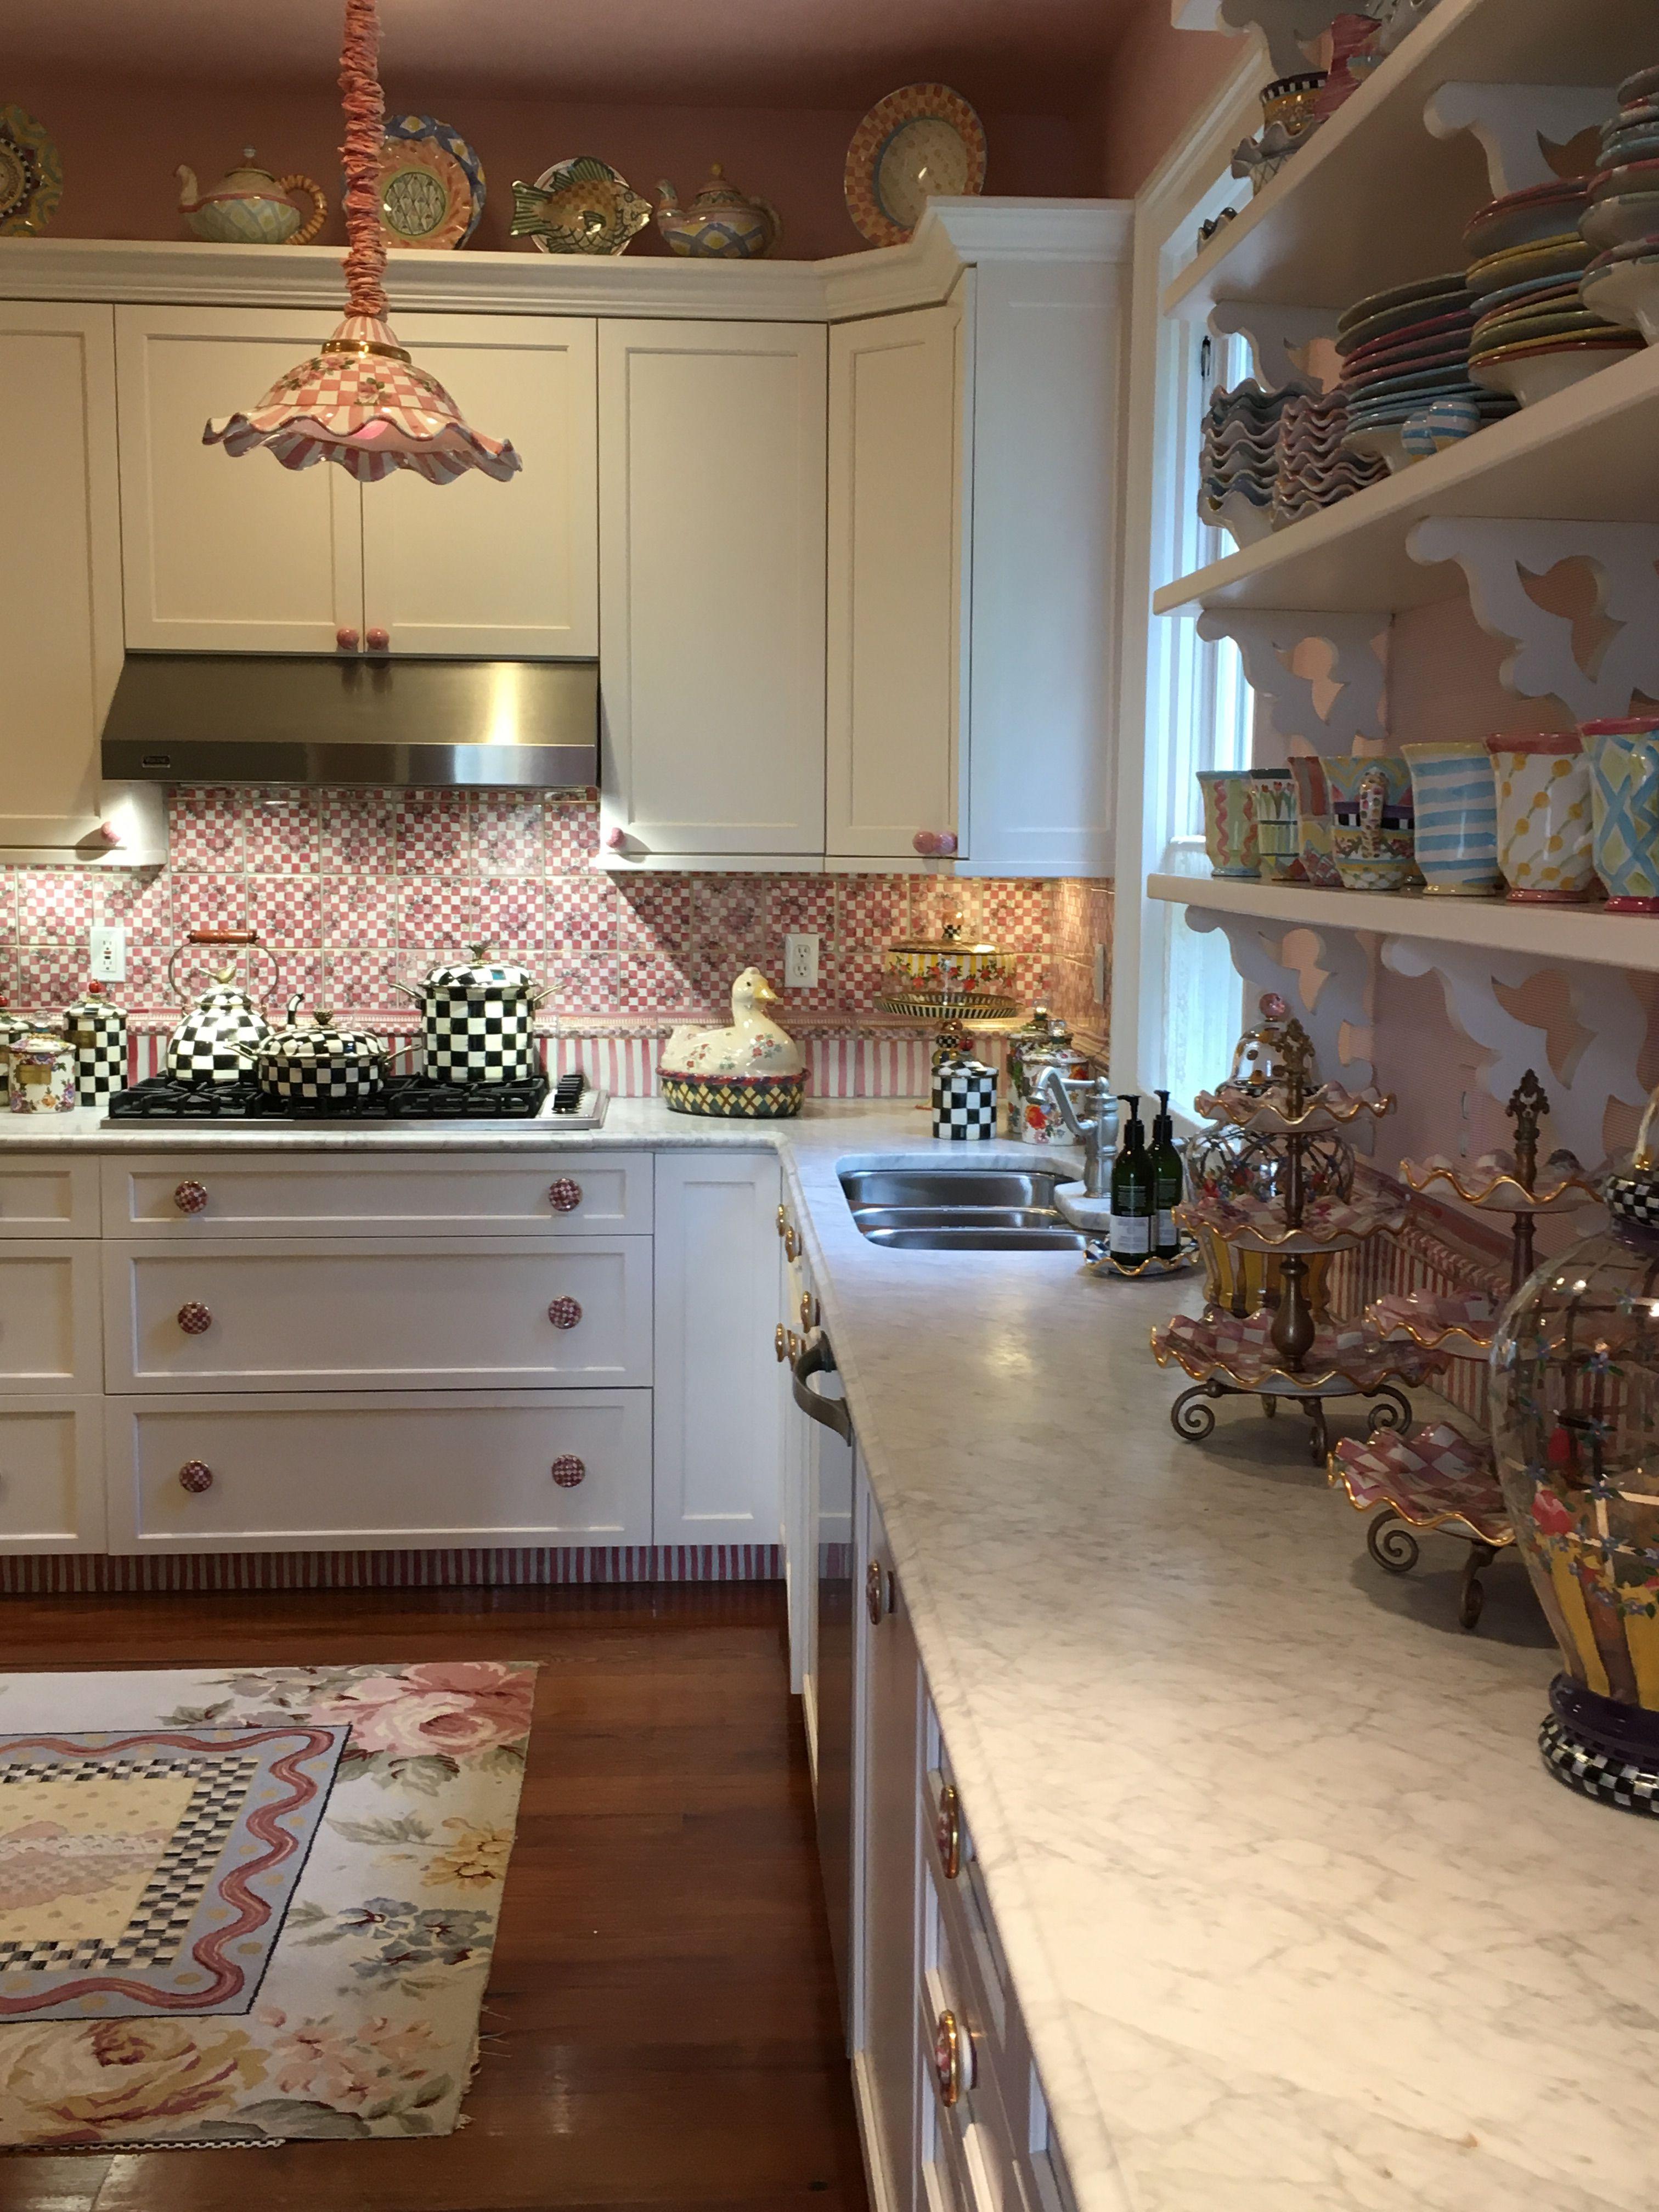 Pin By Barbara Kirkmeyer On Alexandria Bay Niagara Falls Buffalo And More Home Decor Kitchen Cabinets Decor